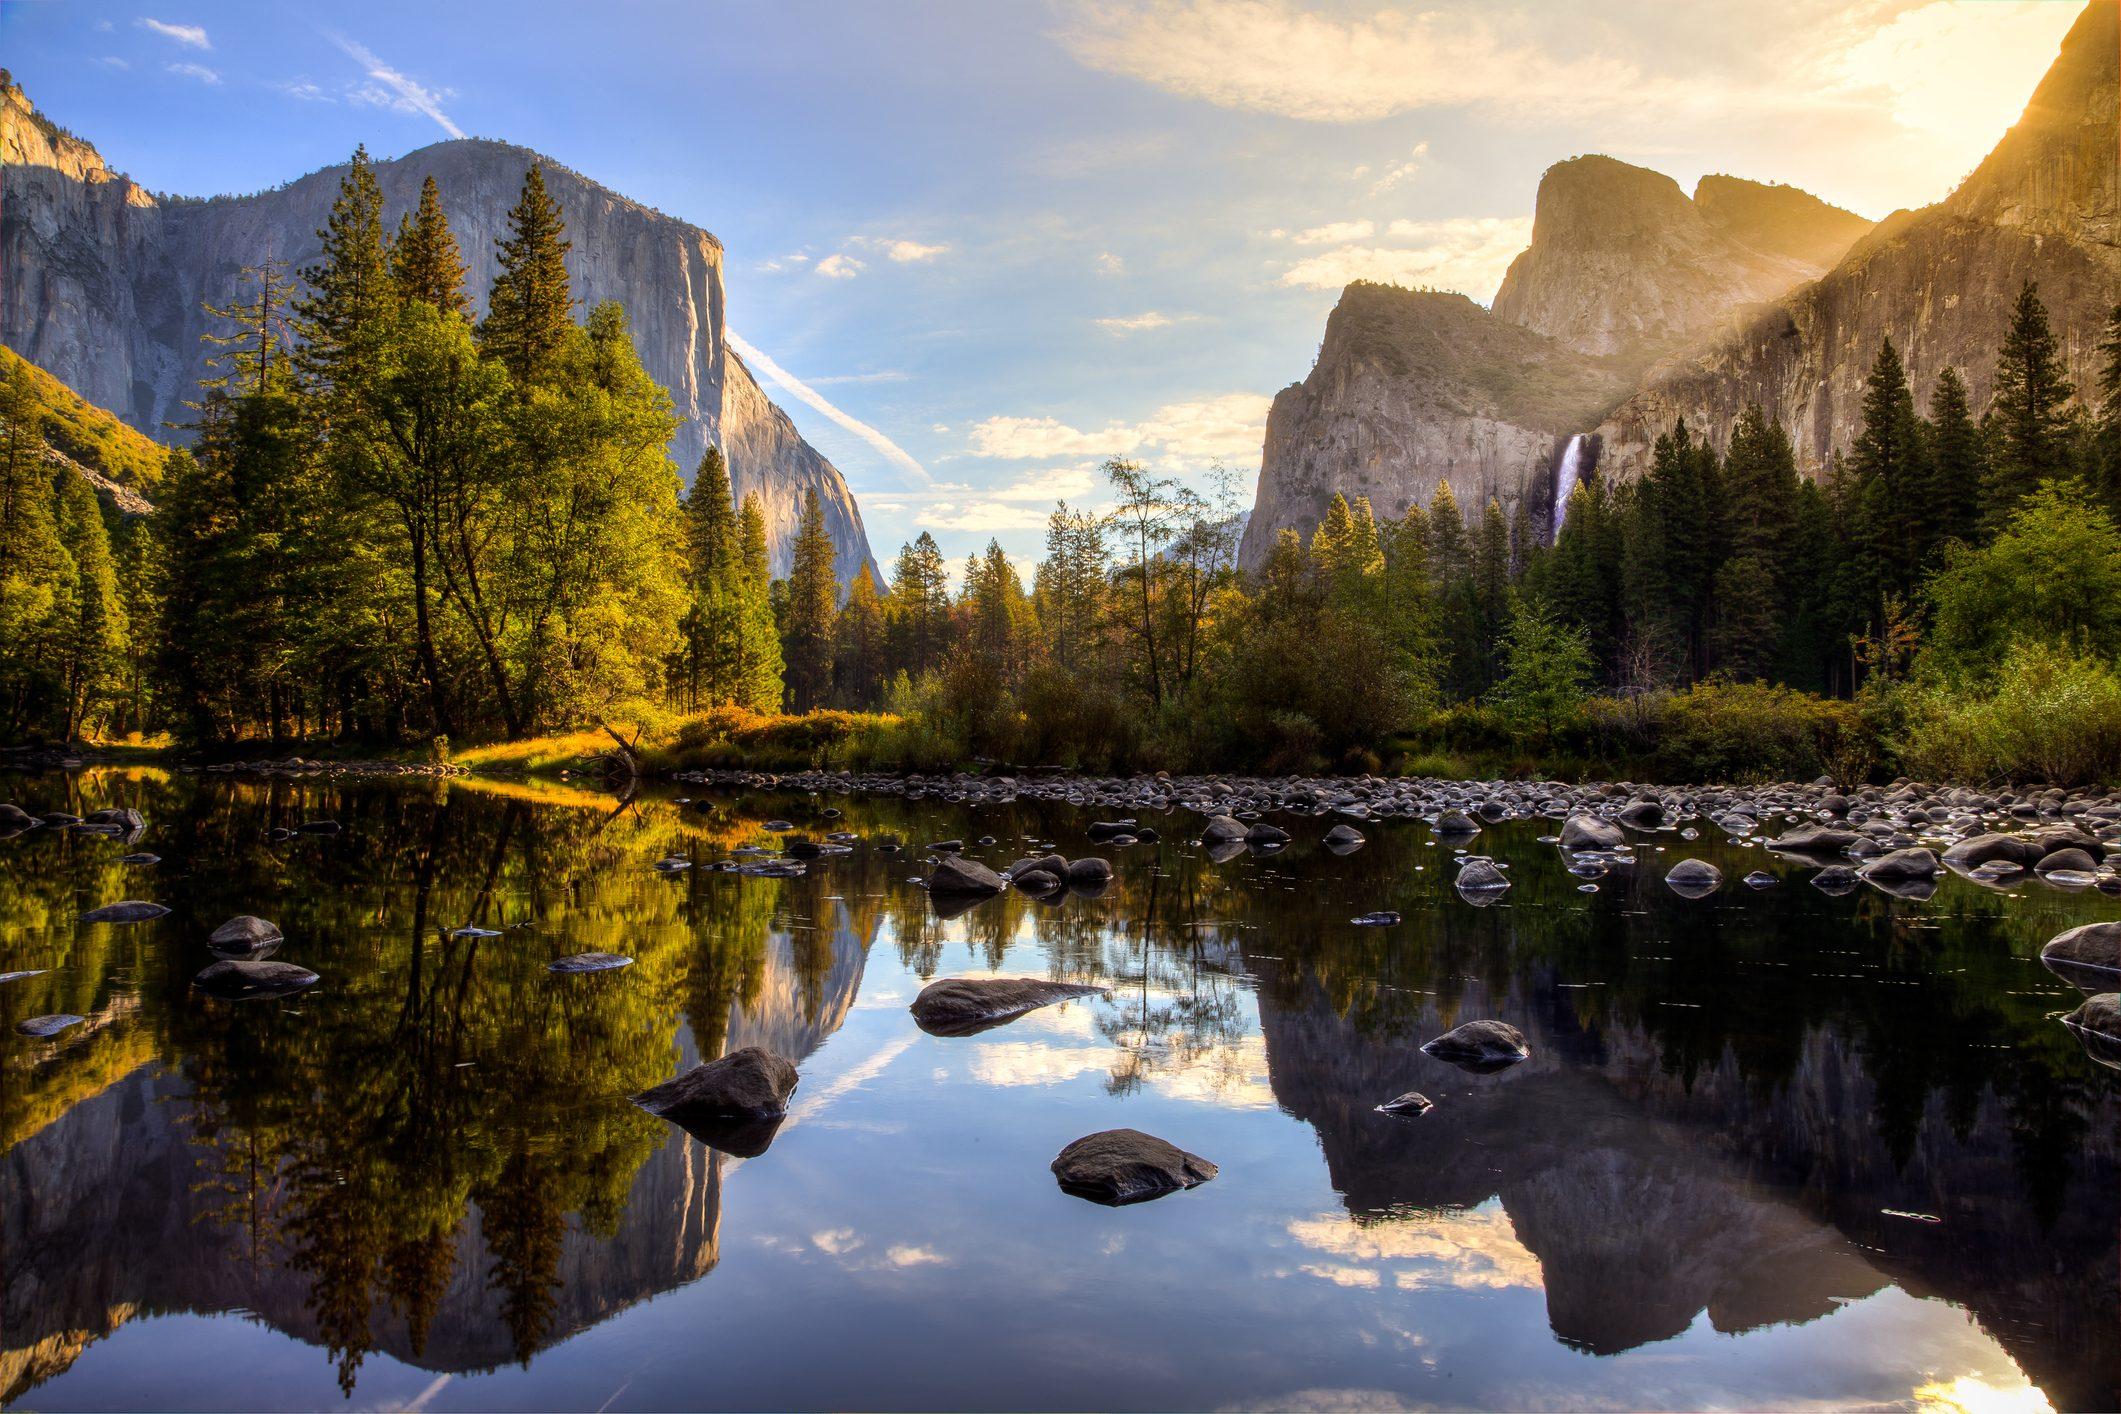 Sunrise on Yosemite Valley reflecting in the water at Yosemite National Park, California